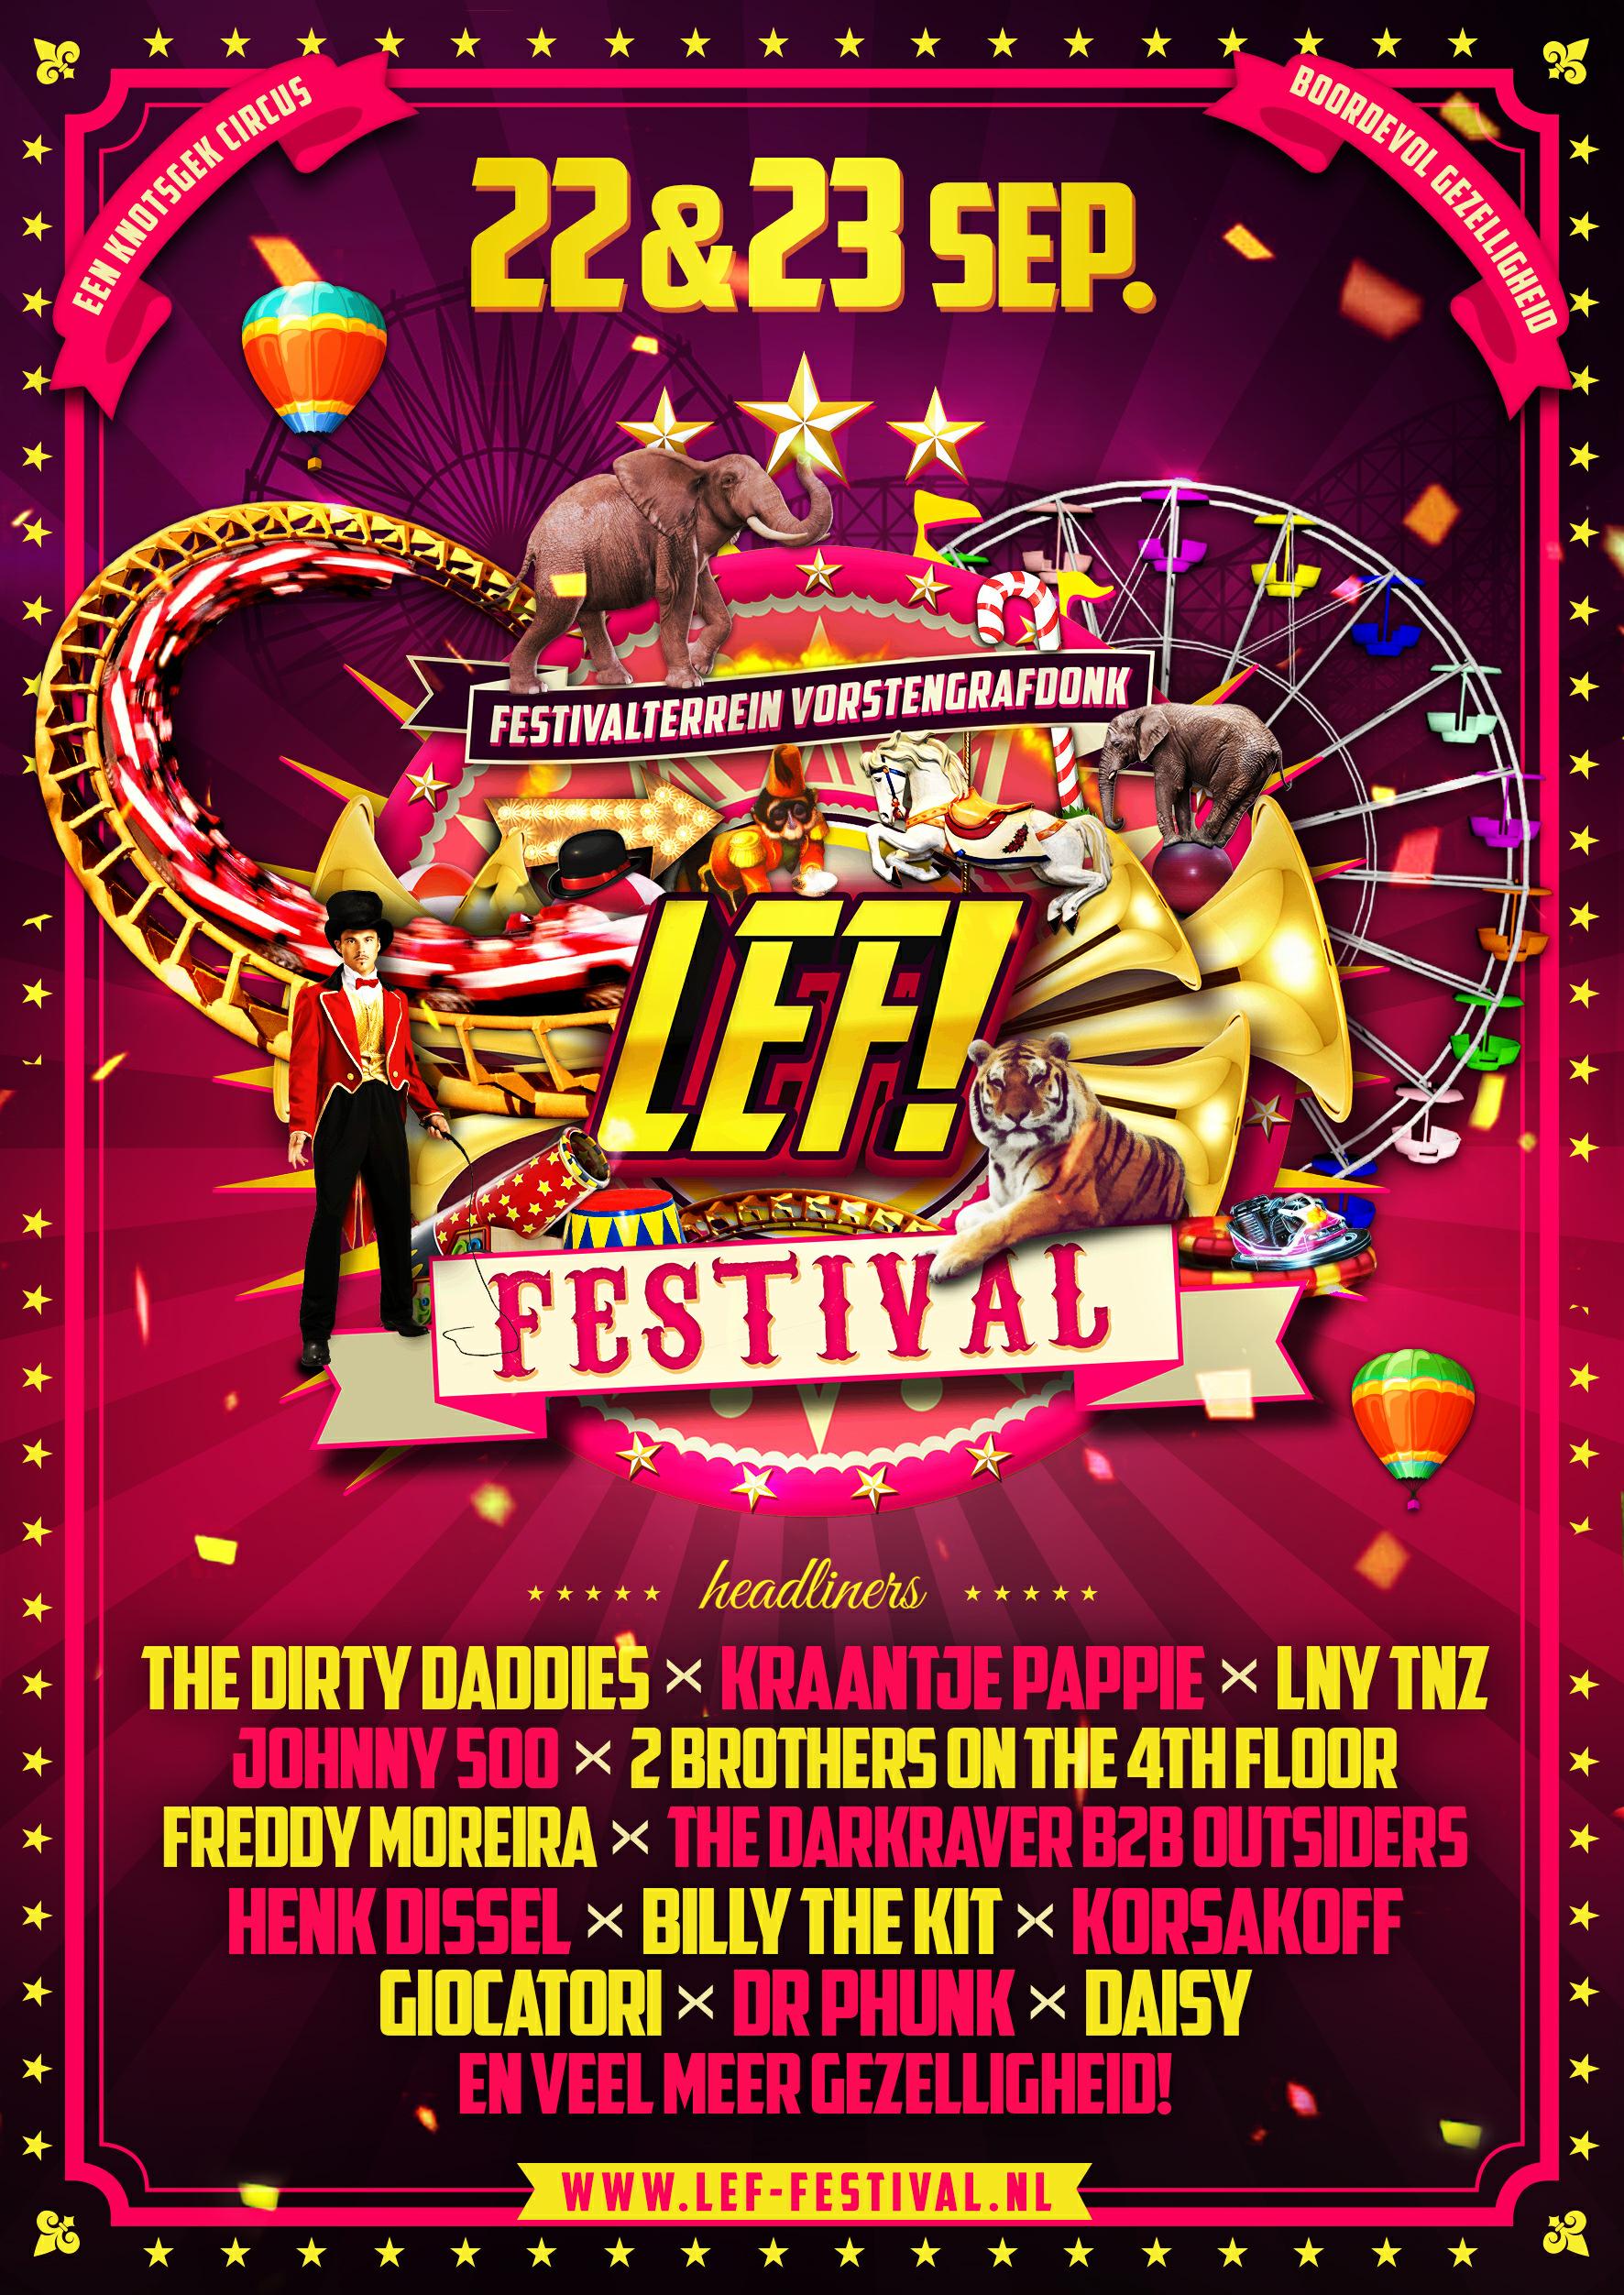 LEF! Festival · 23 September 2017 4fa0e985c21f7